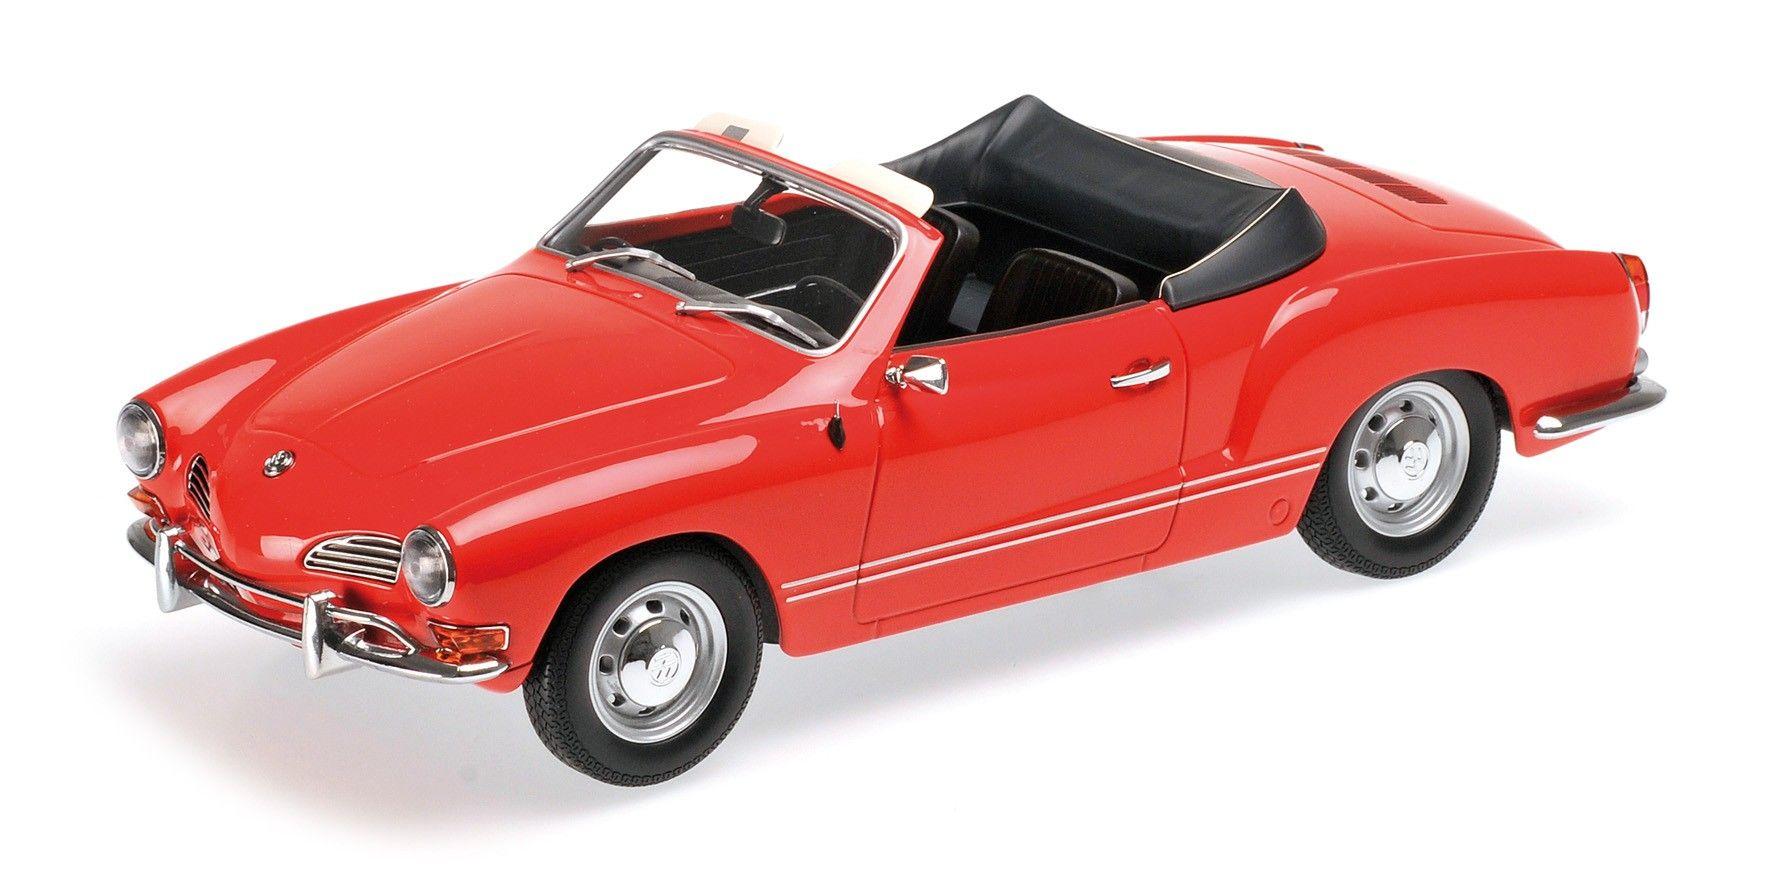 VOLKSWAGEN KARMANN GHIA CONVERTIBLE 1970 RED Car